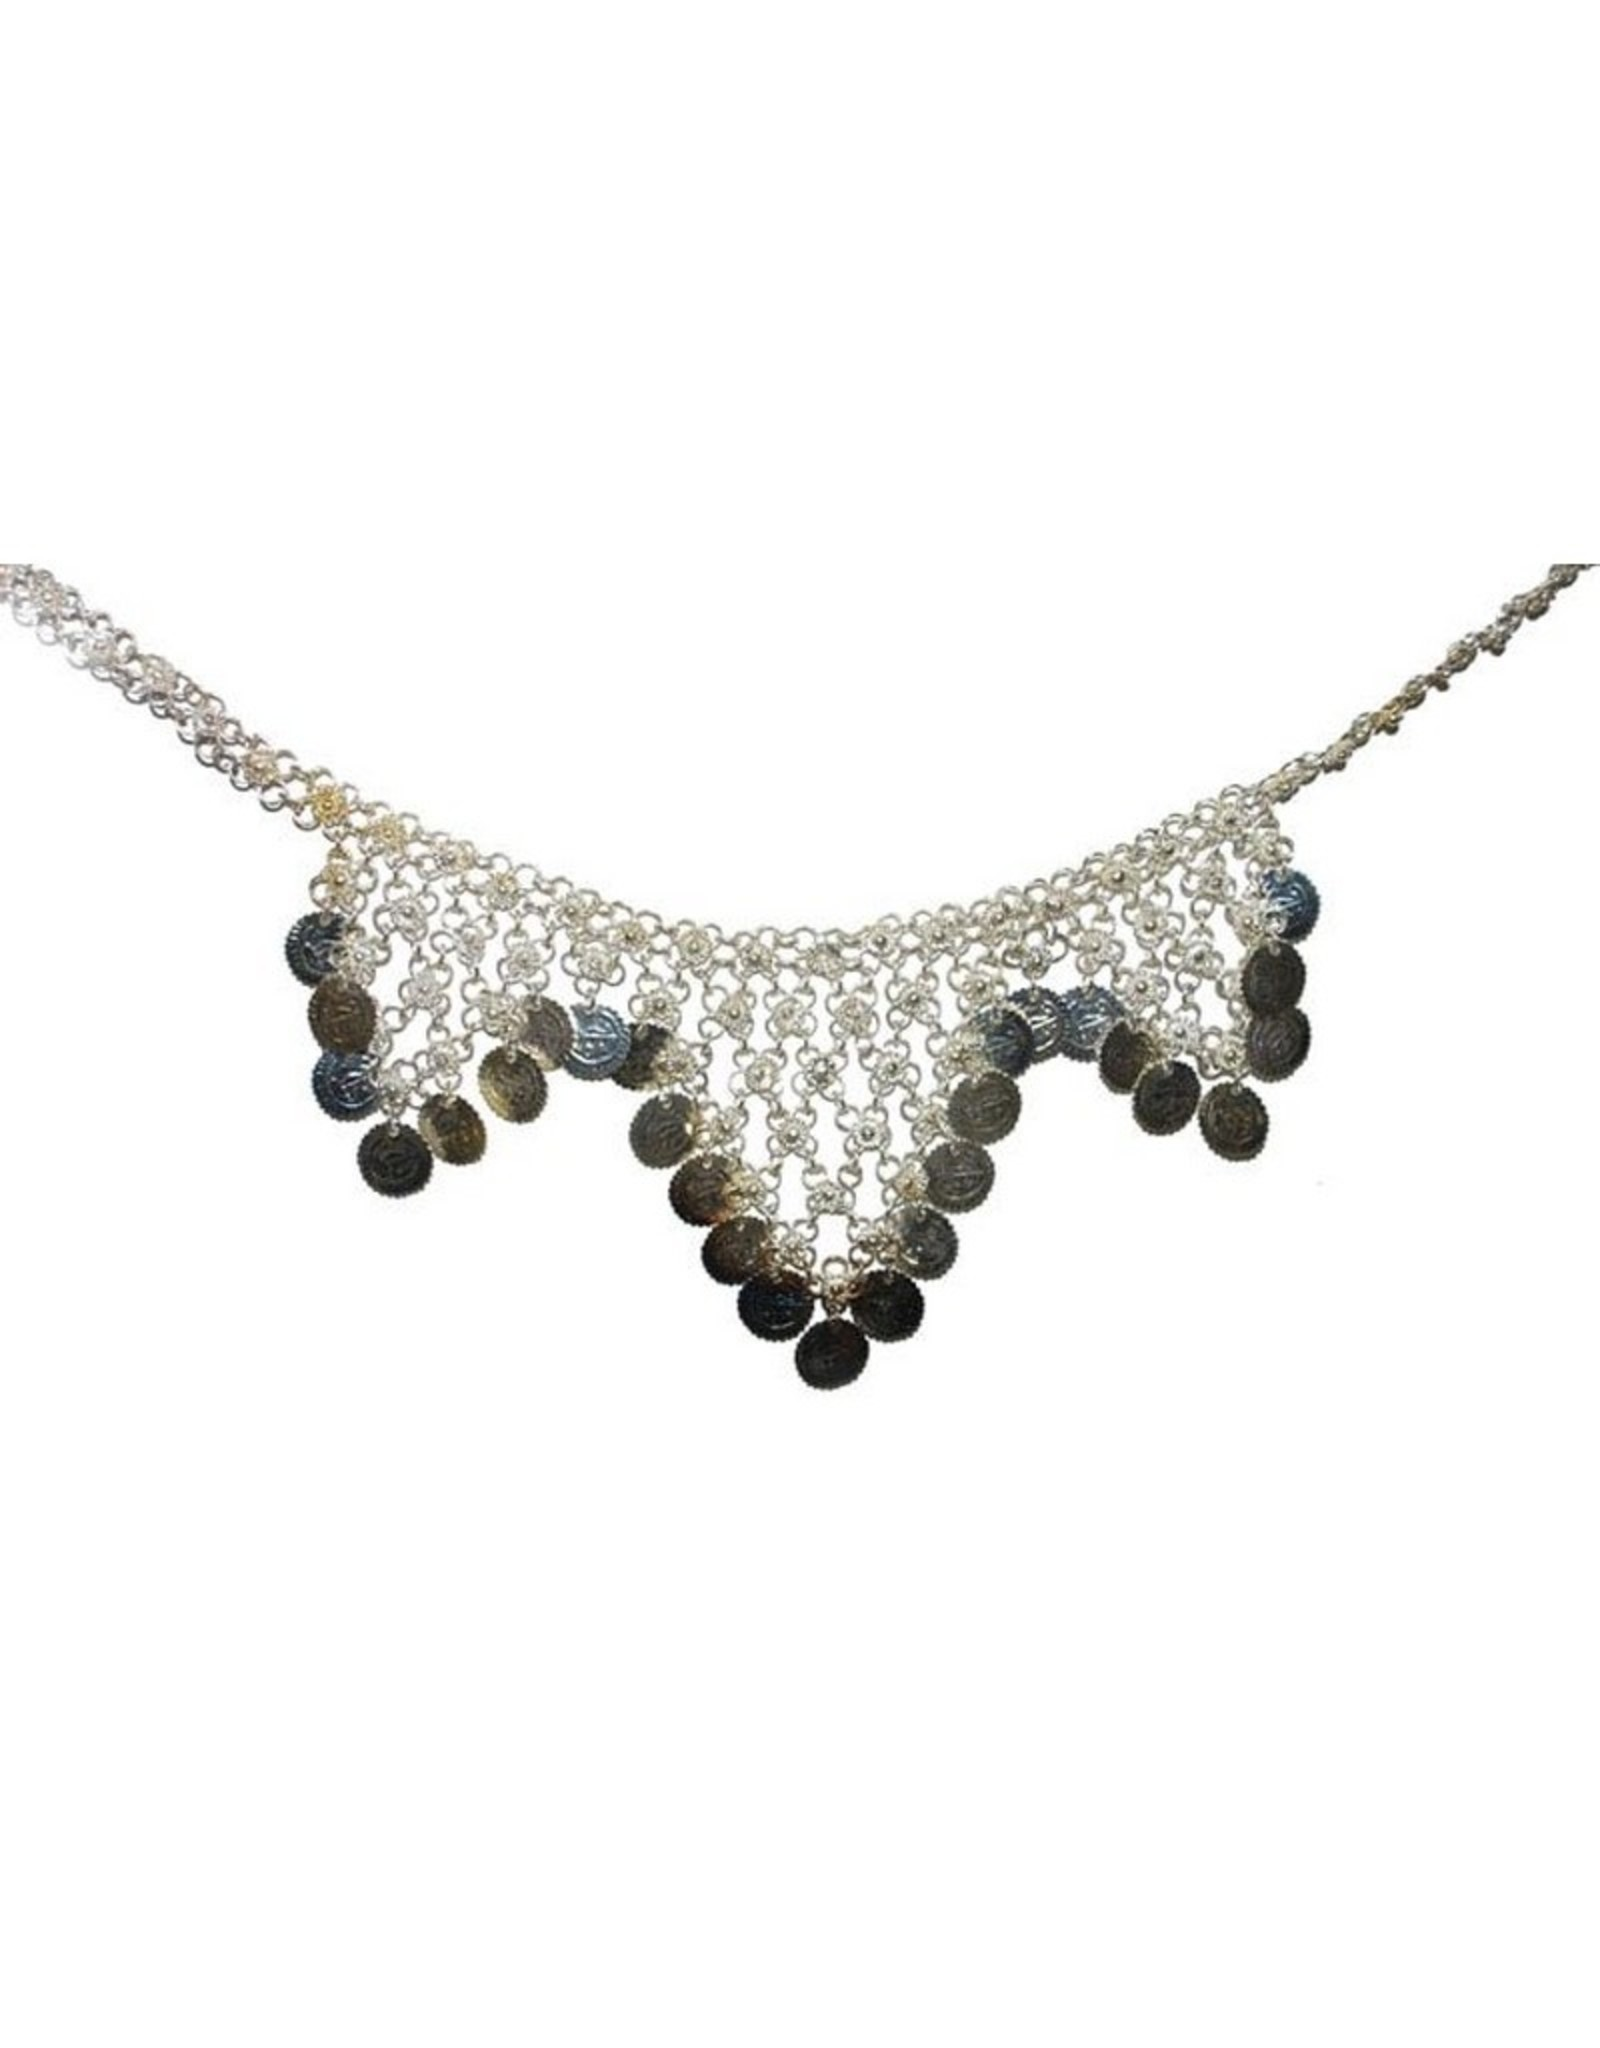 ESPA halsketting arabisch - gipsy